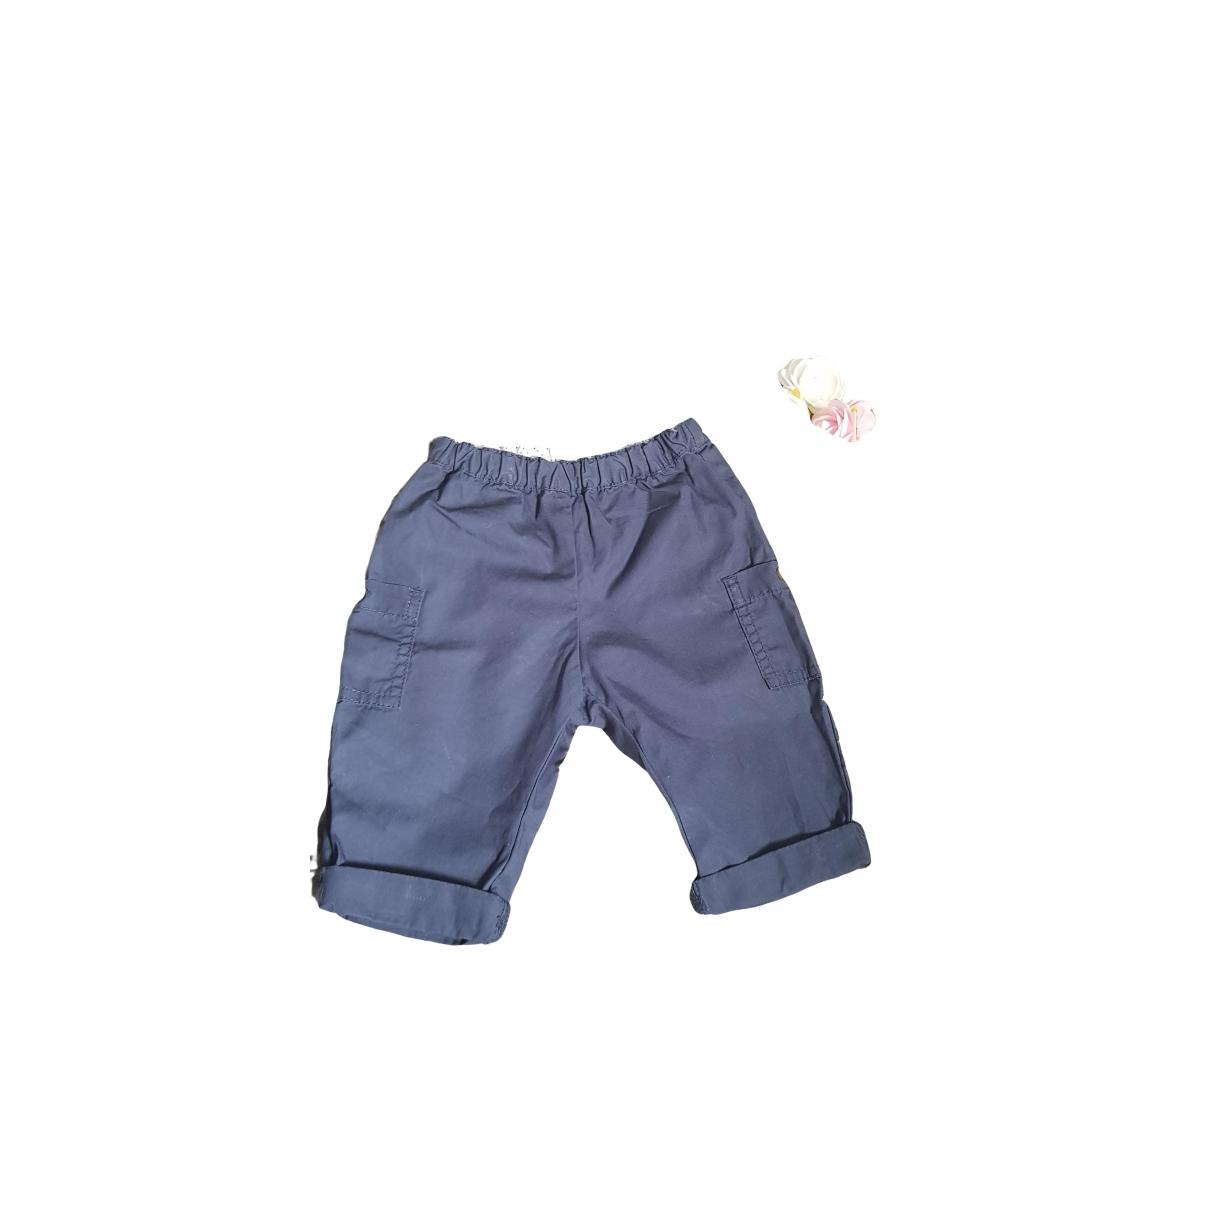 Petit Bateau \N Blue Cotton Trousers for Kids 6 months - up to 67cm FR